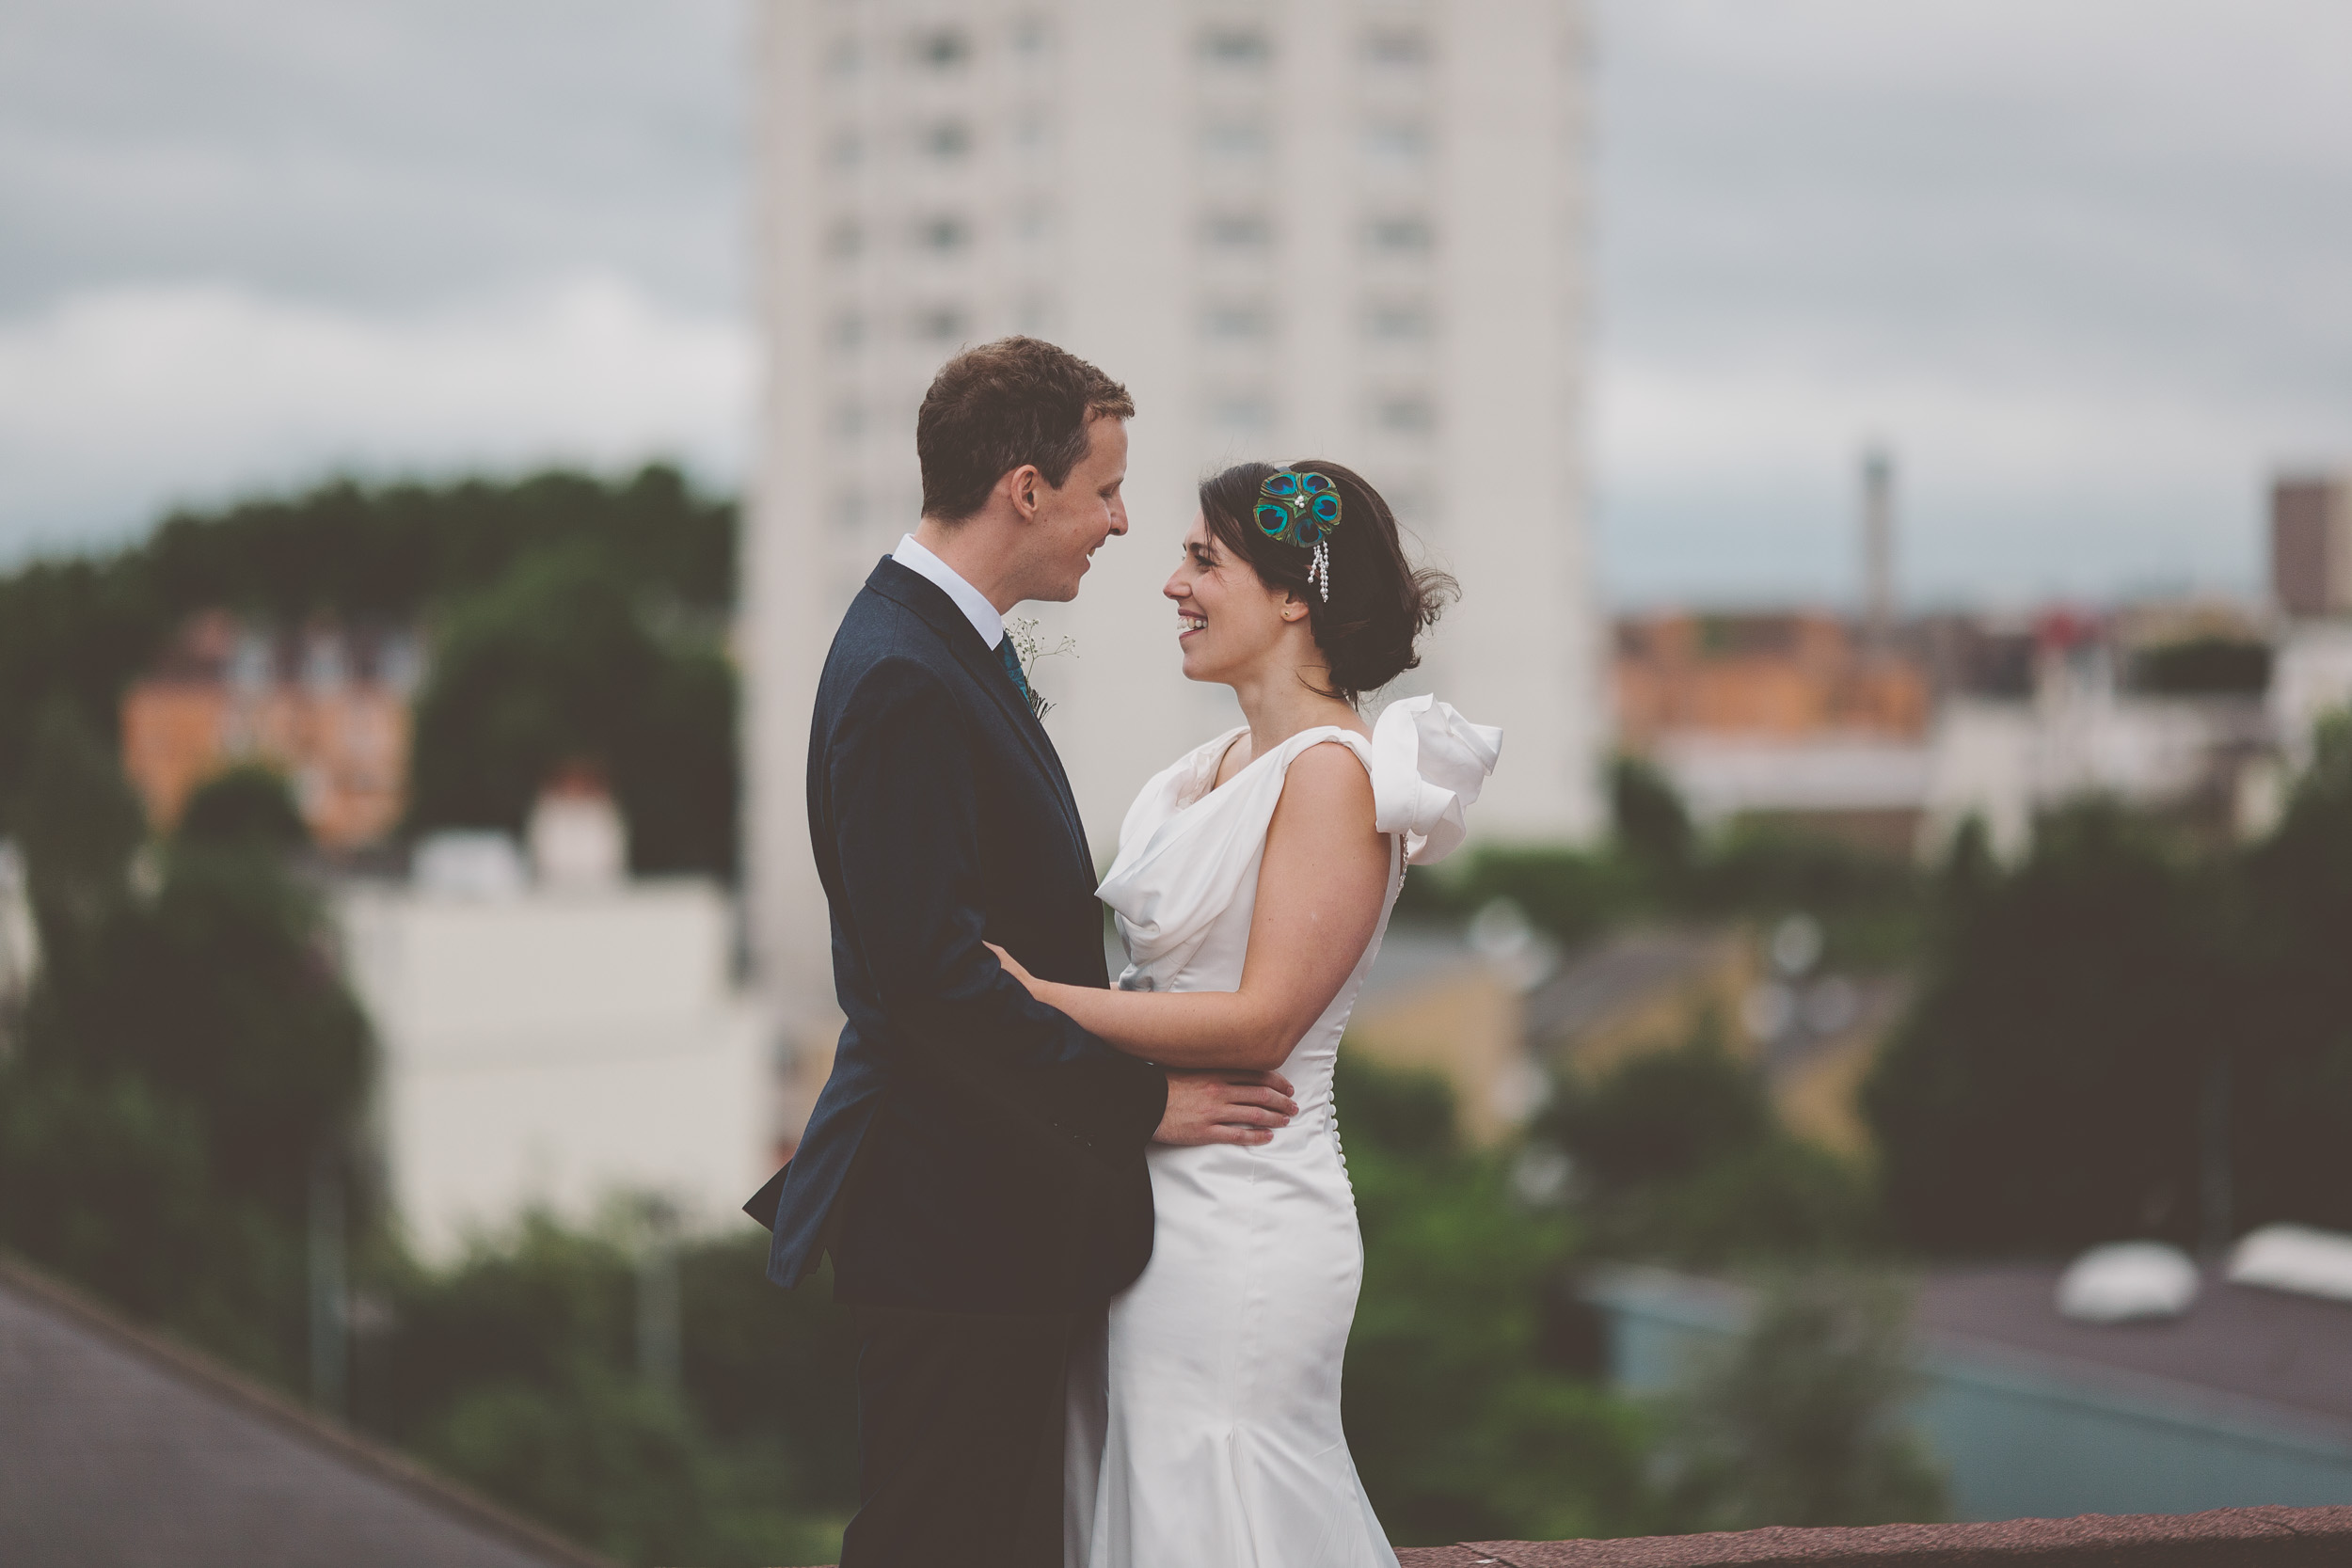 islington-town-hall-4th-floor-studios-wedding279.jpg